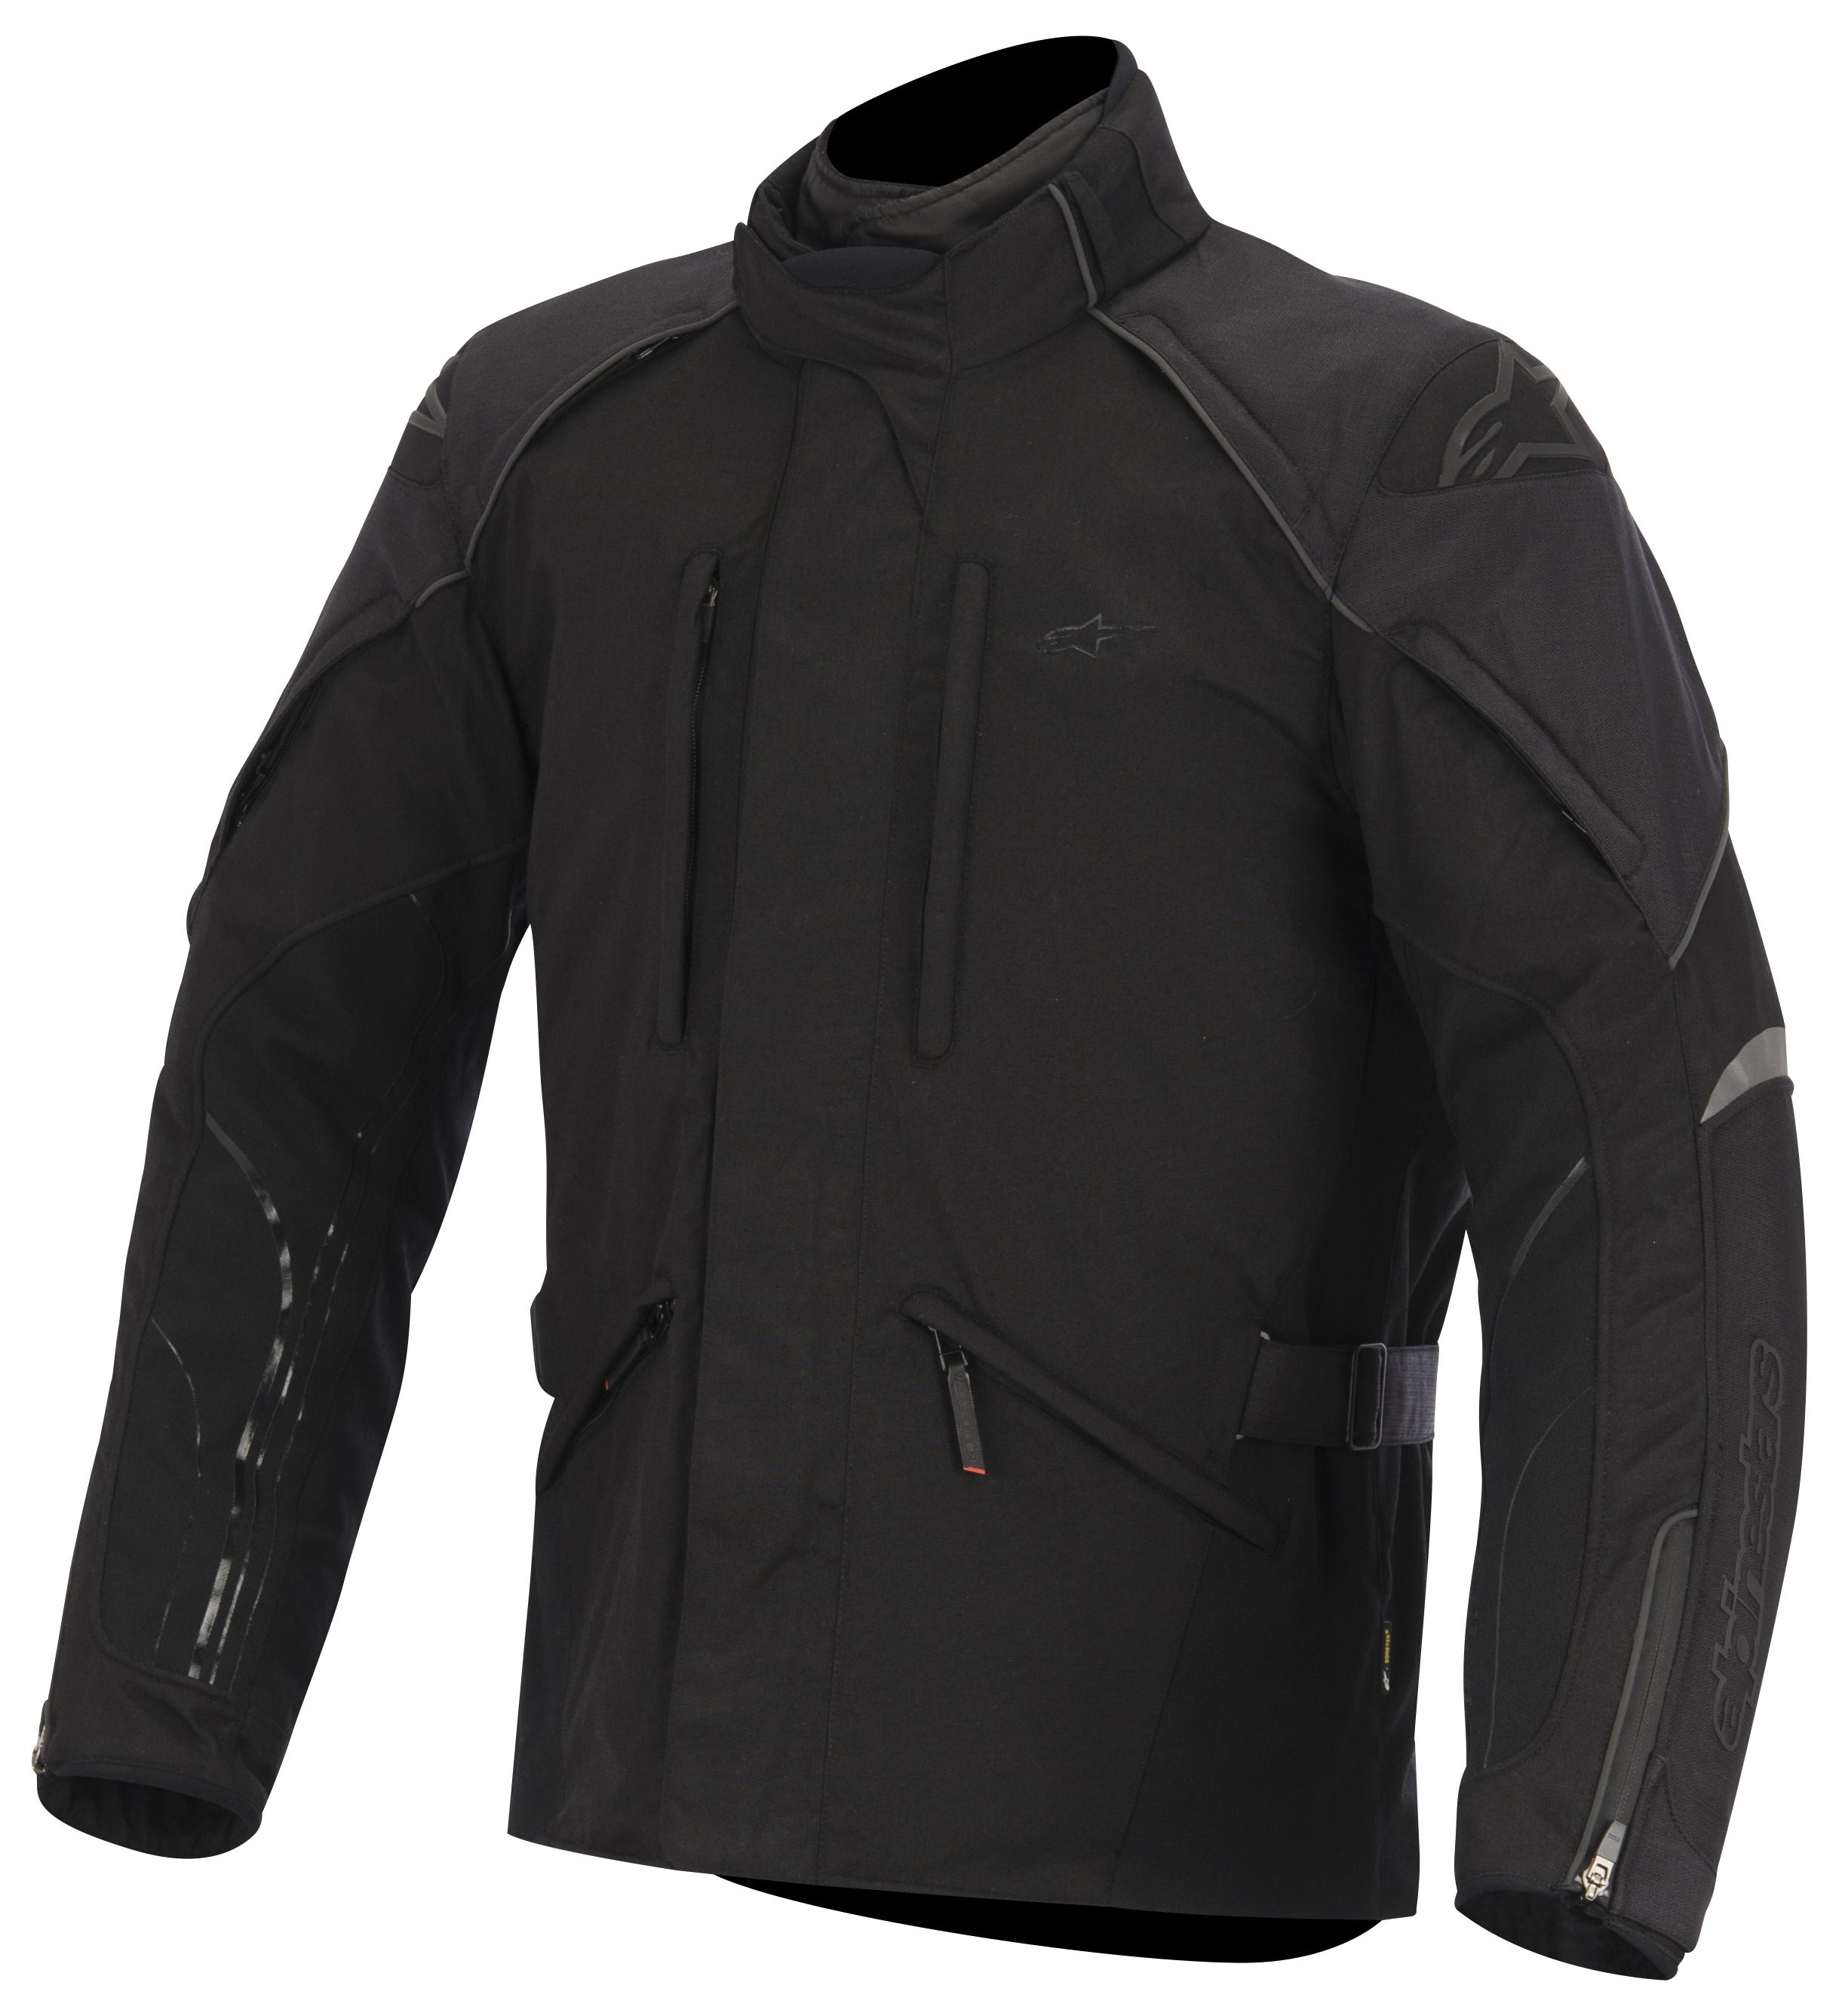 alpinestars new land gore tex jacket 40 off. Black Bedroom Furniture Sets. Home Design Ideas